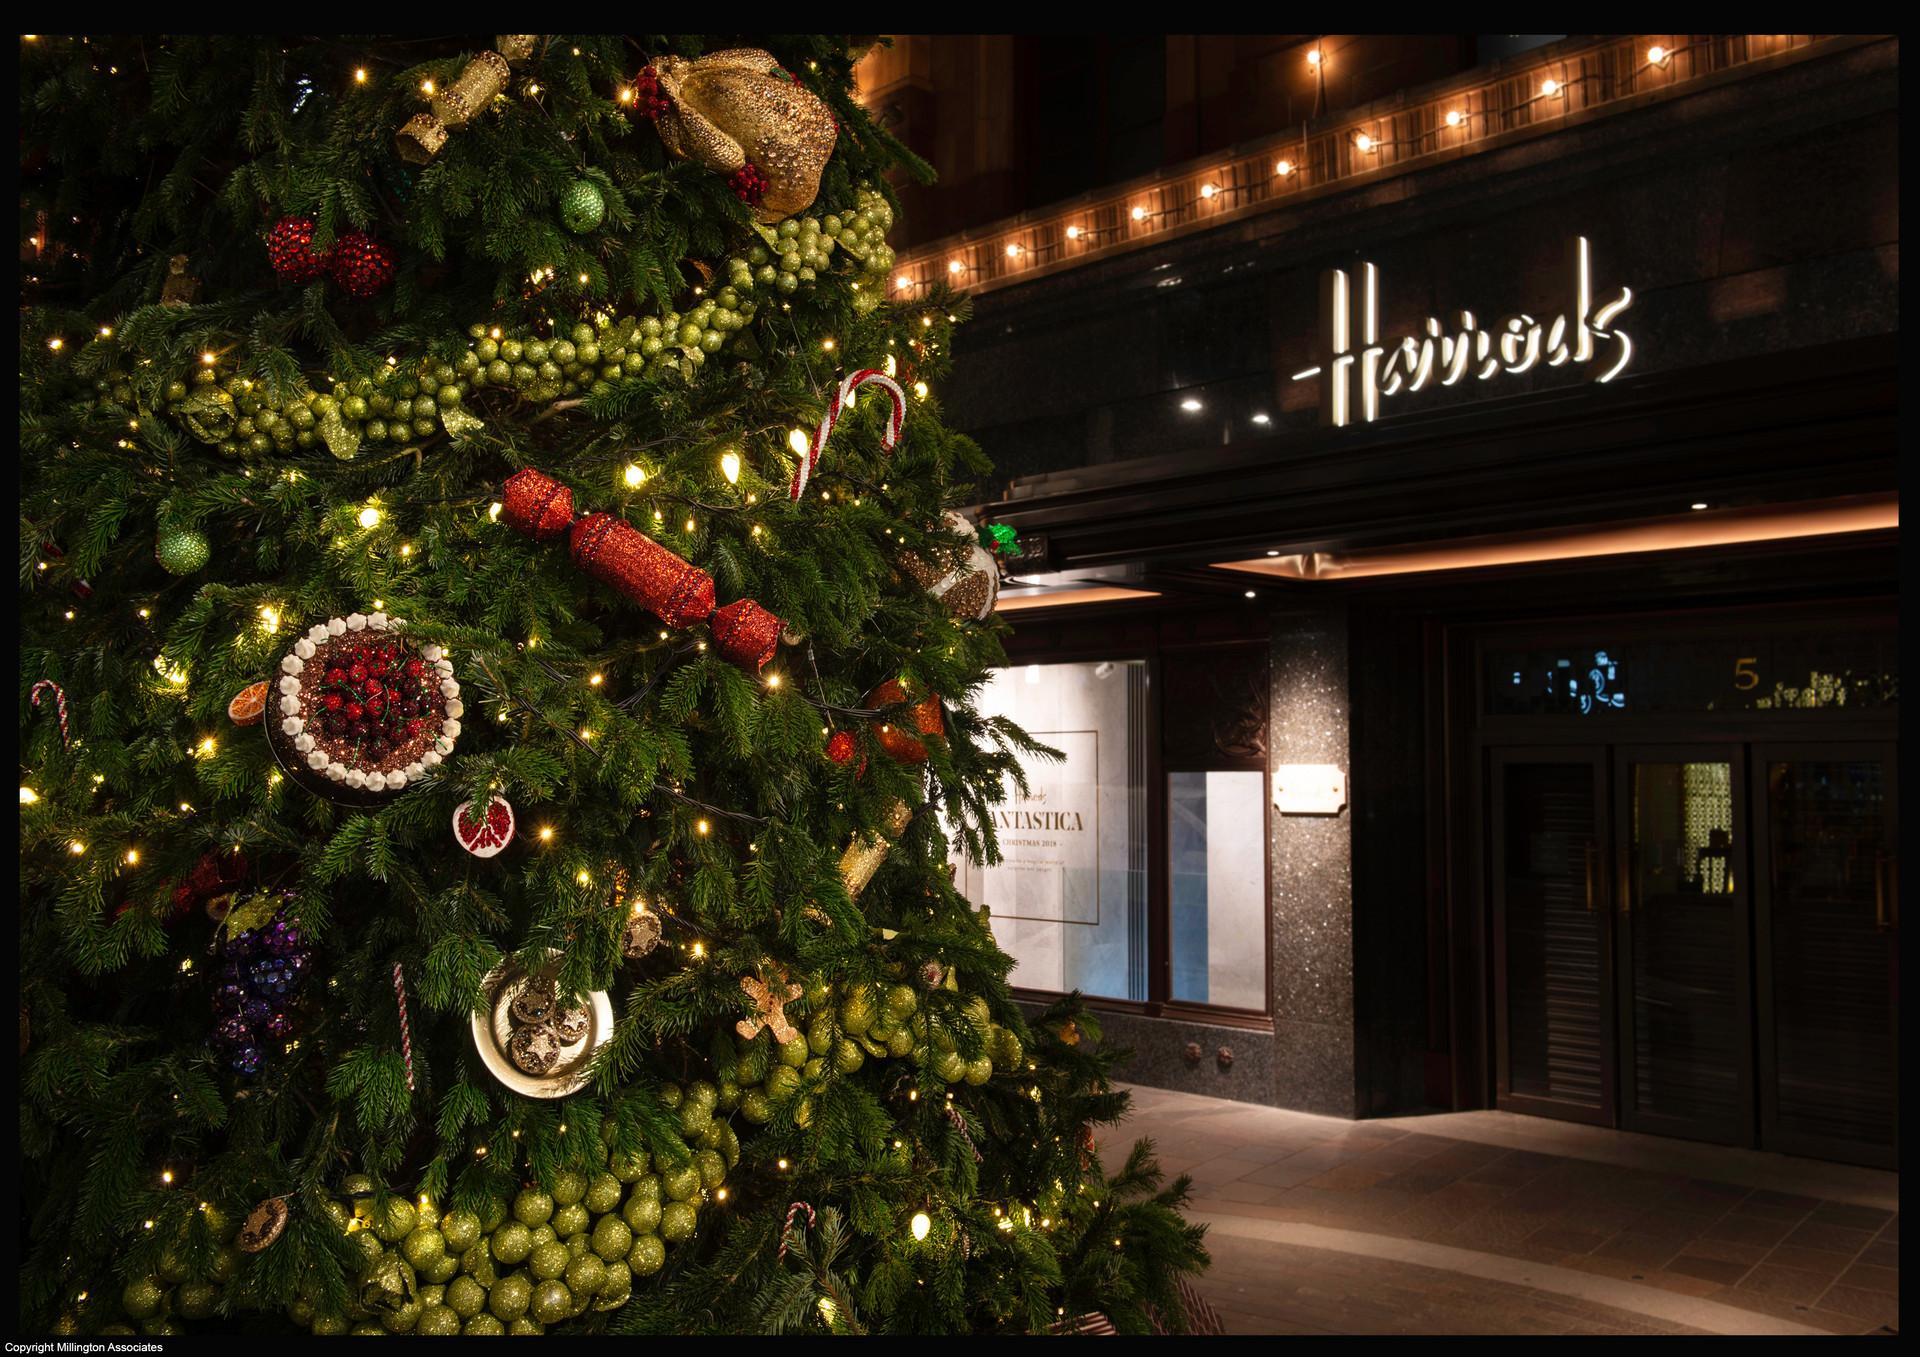 Harrods, Christmas tree, Nov 2018